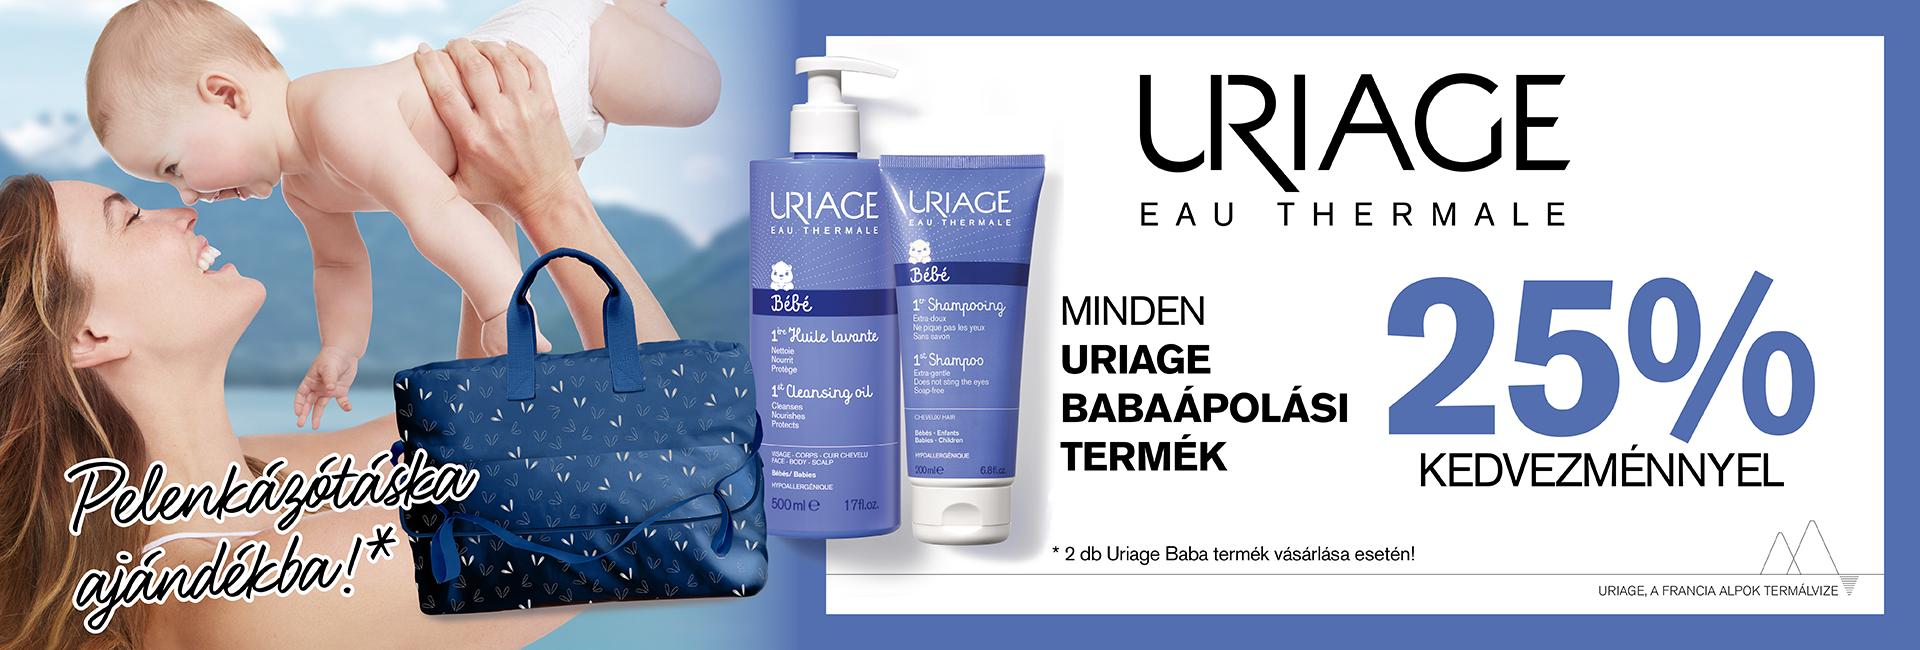 2020. augusztus 31-ig minden Uriage BABA termékre 25% kedvezményt adunk!